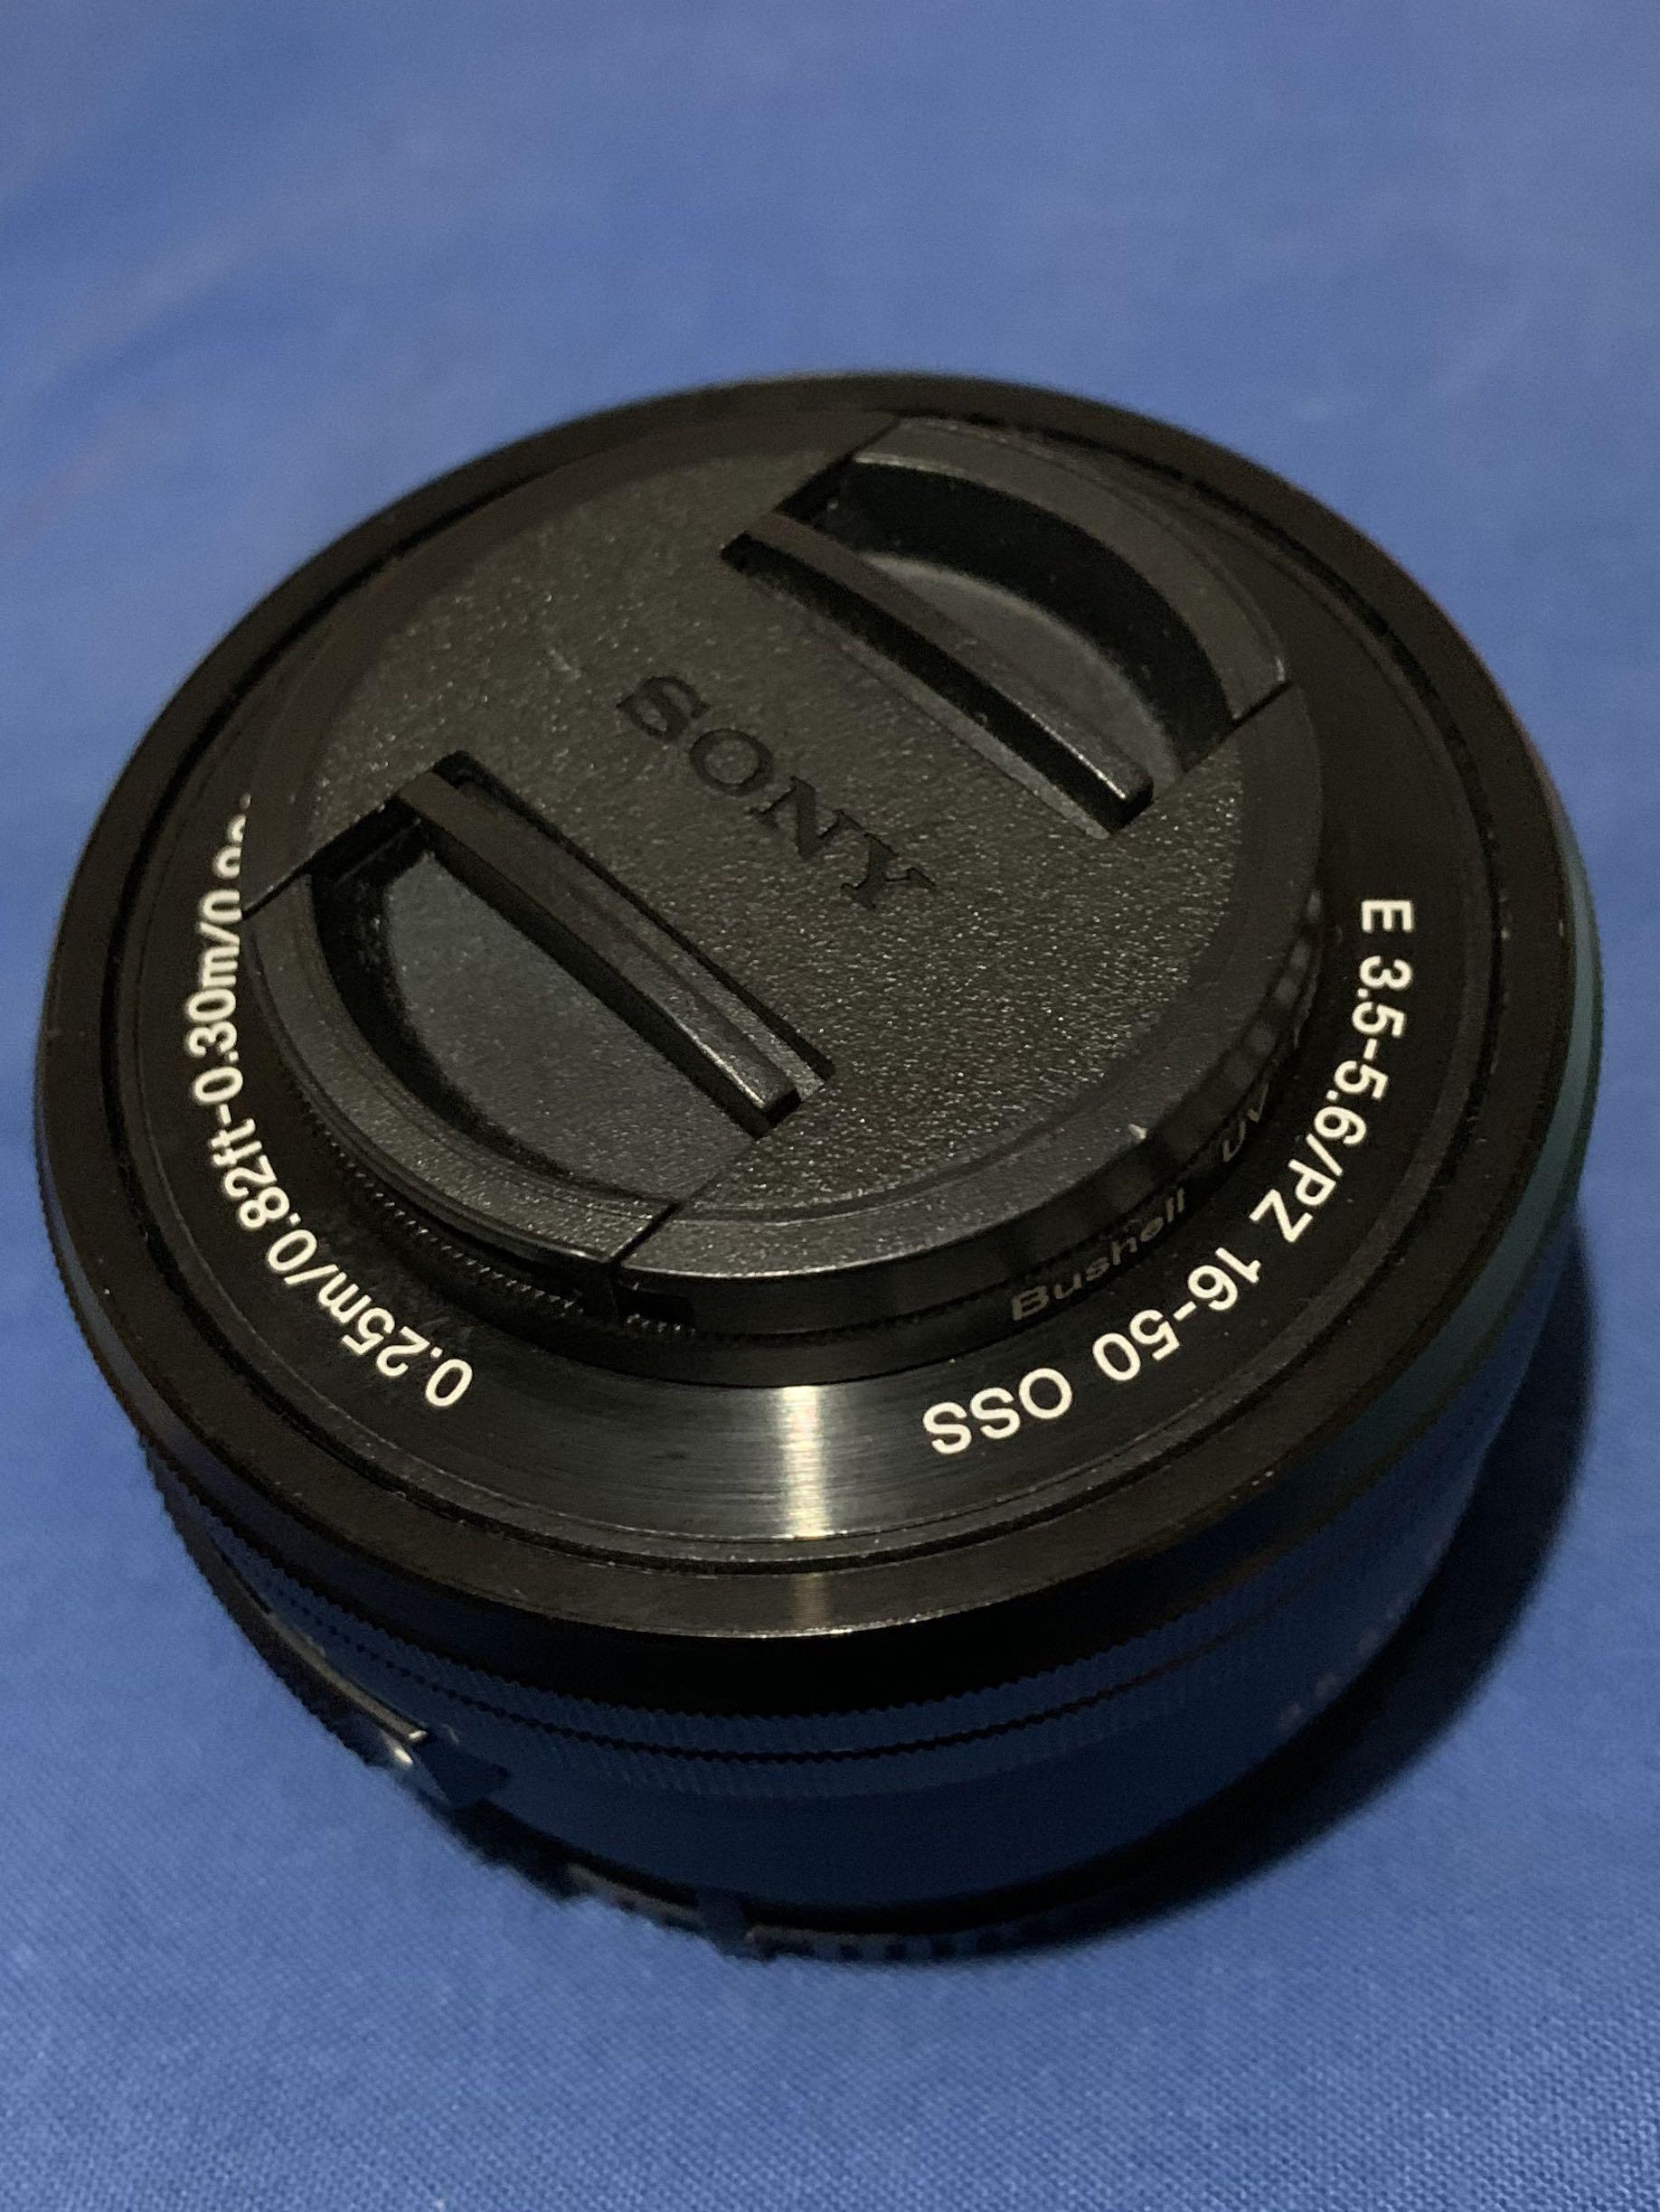 #bisnisbaru Lensa Sony 16-50mm  OSS #bisnisbaru